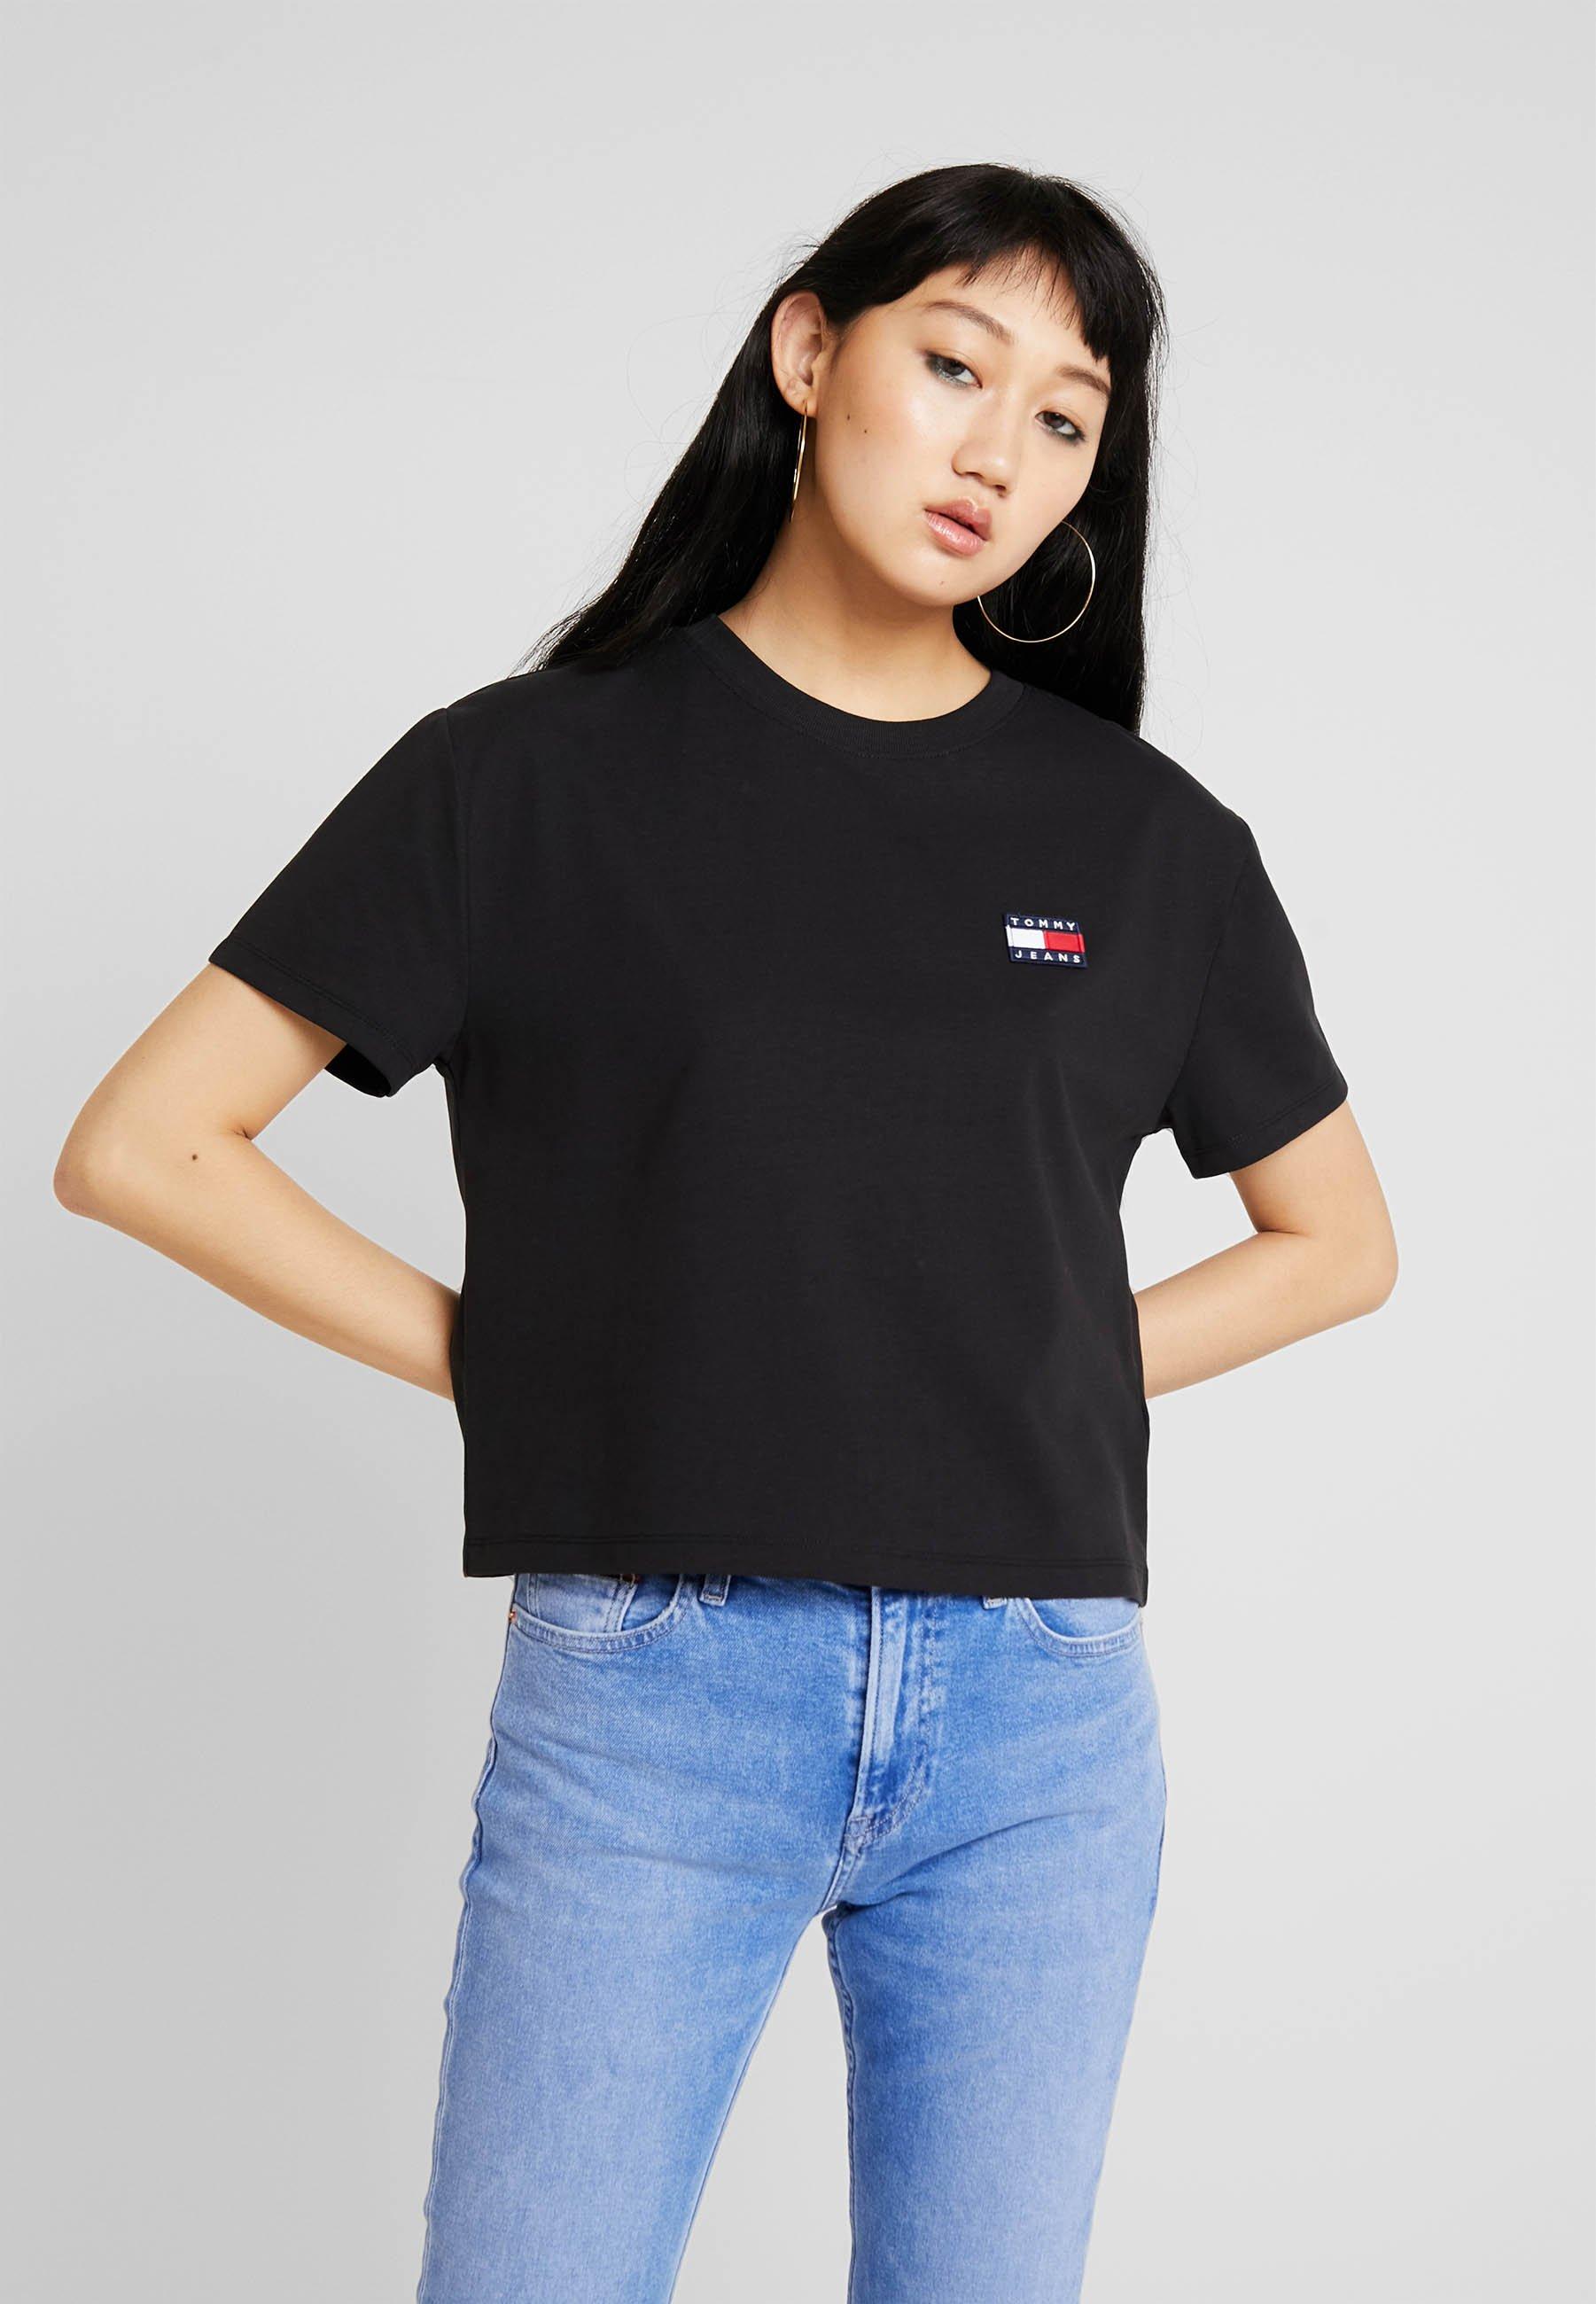 Tommy Black Tjw TeeT shirt Jeans Basique Badge htsCQdr